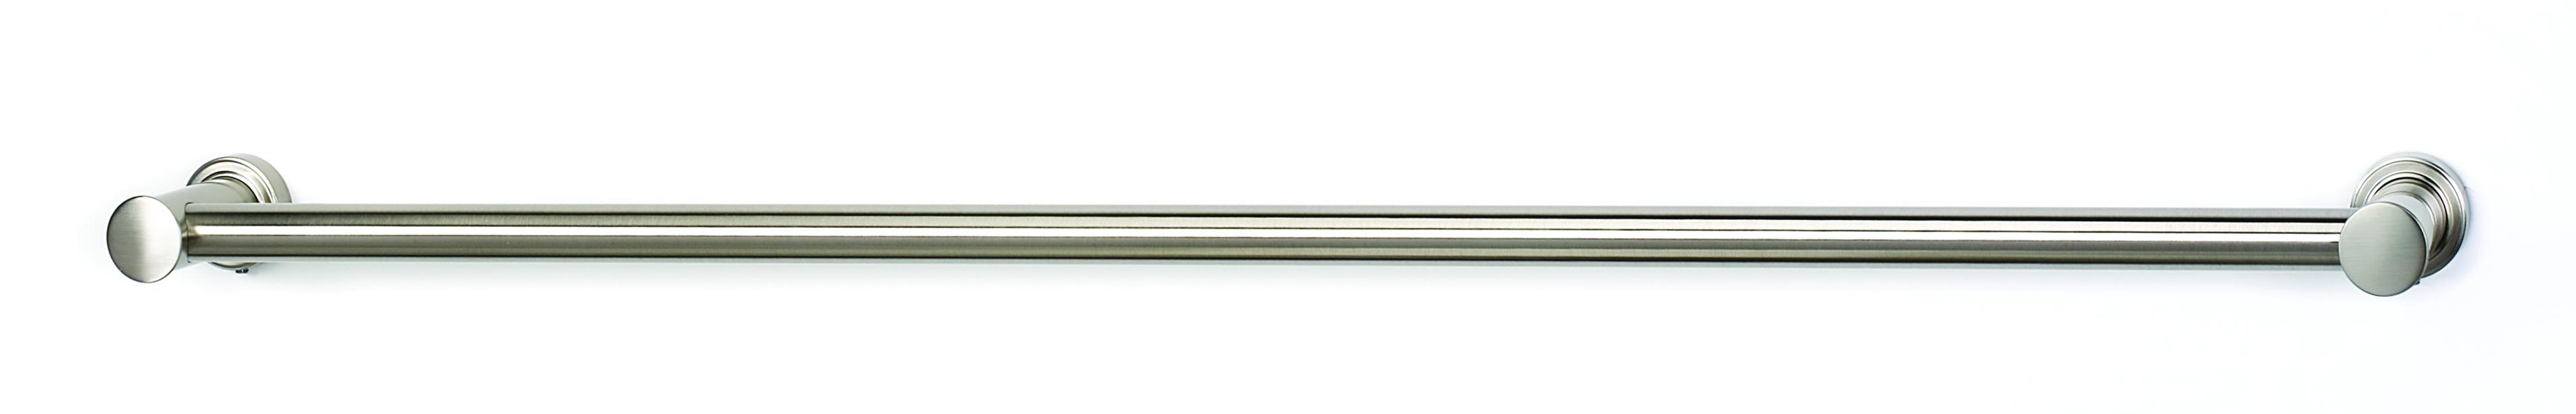 towel bar. A8720-30-SN Towel Bar L